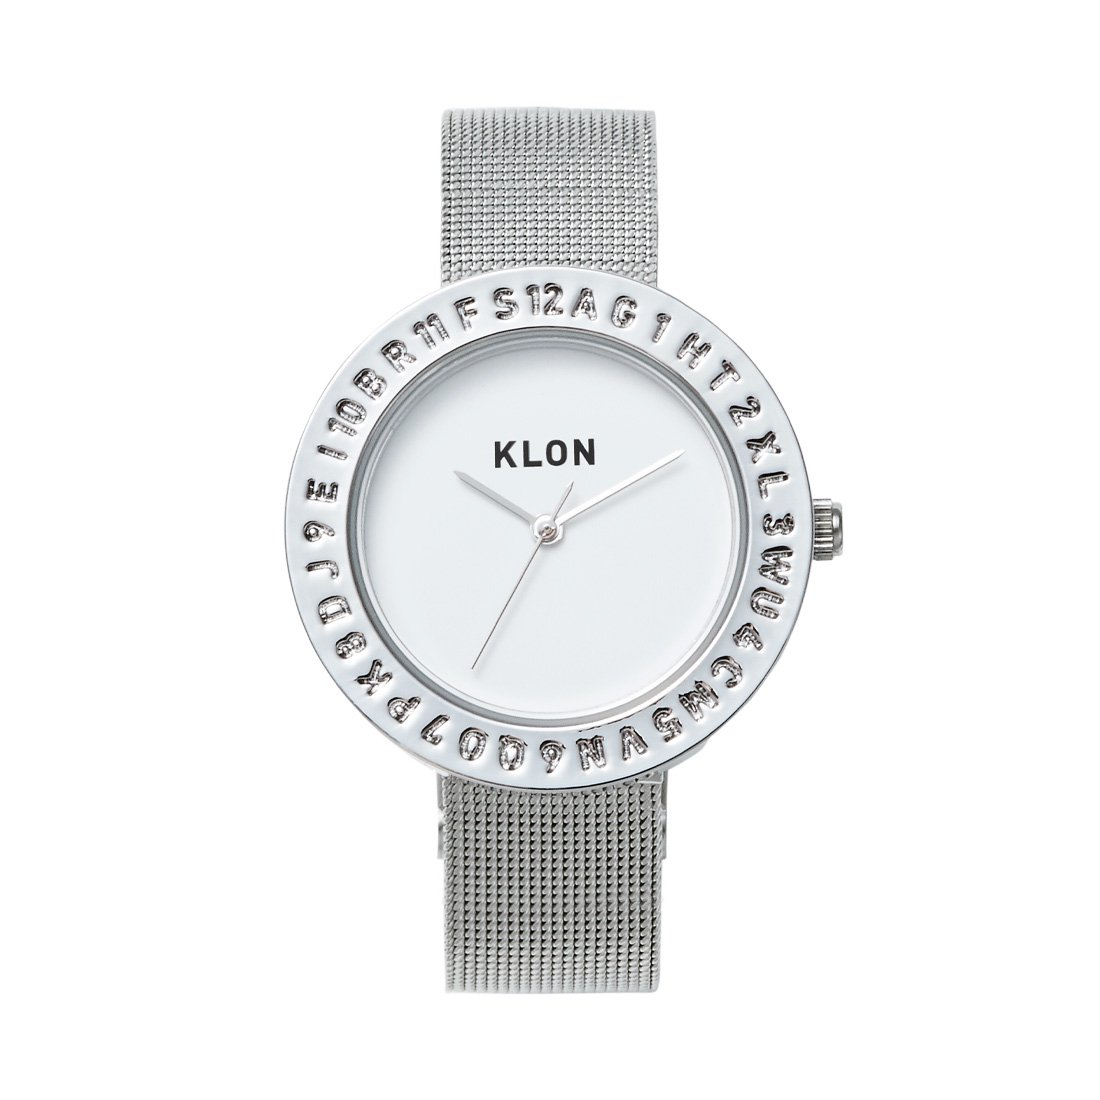 KLON ENGRAVE TIME -SILVER MESH- 33mm